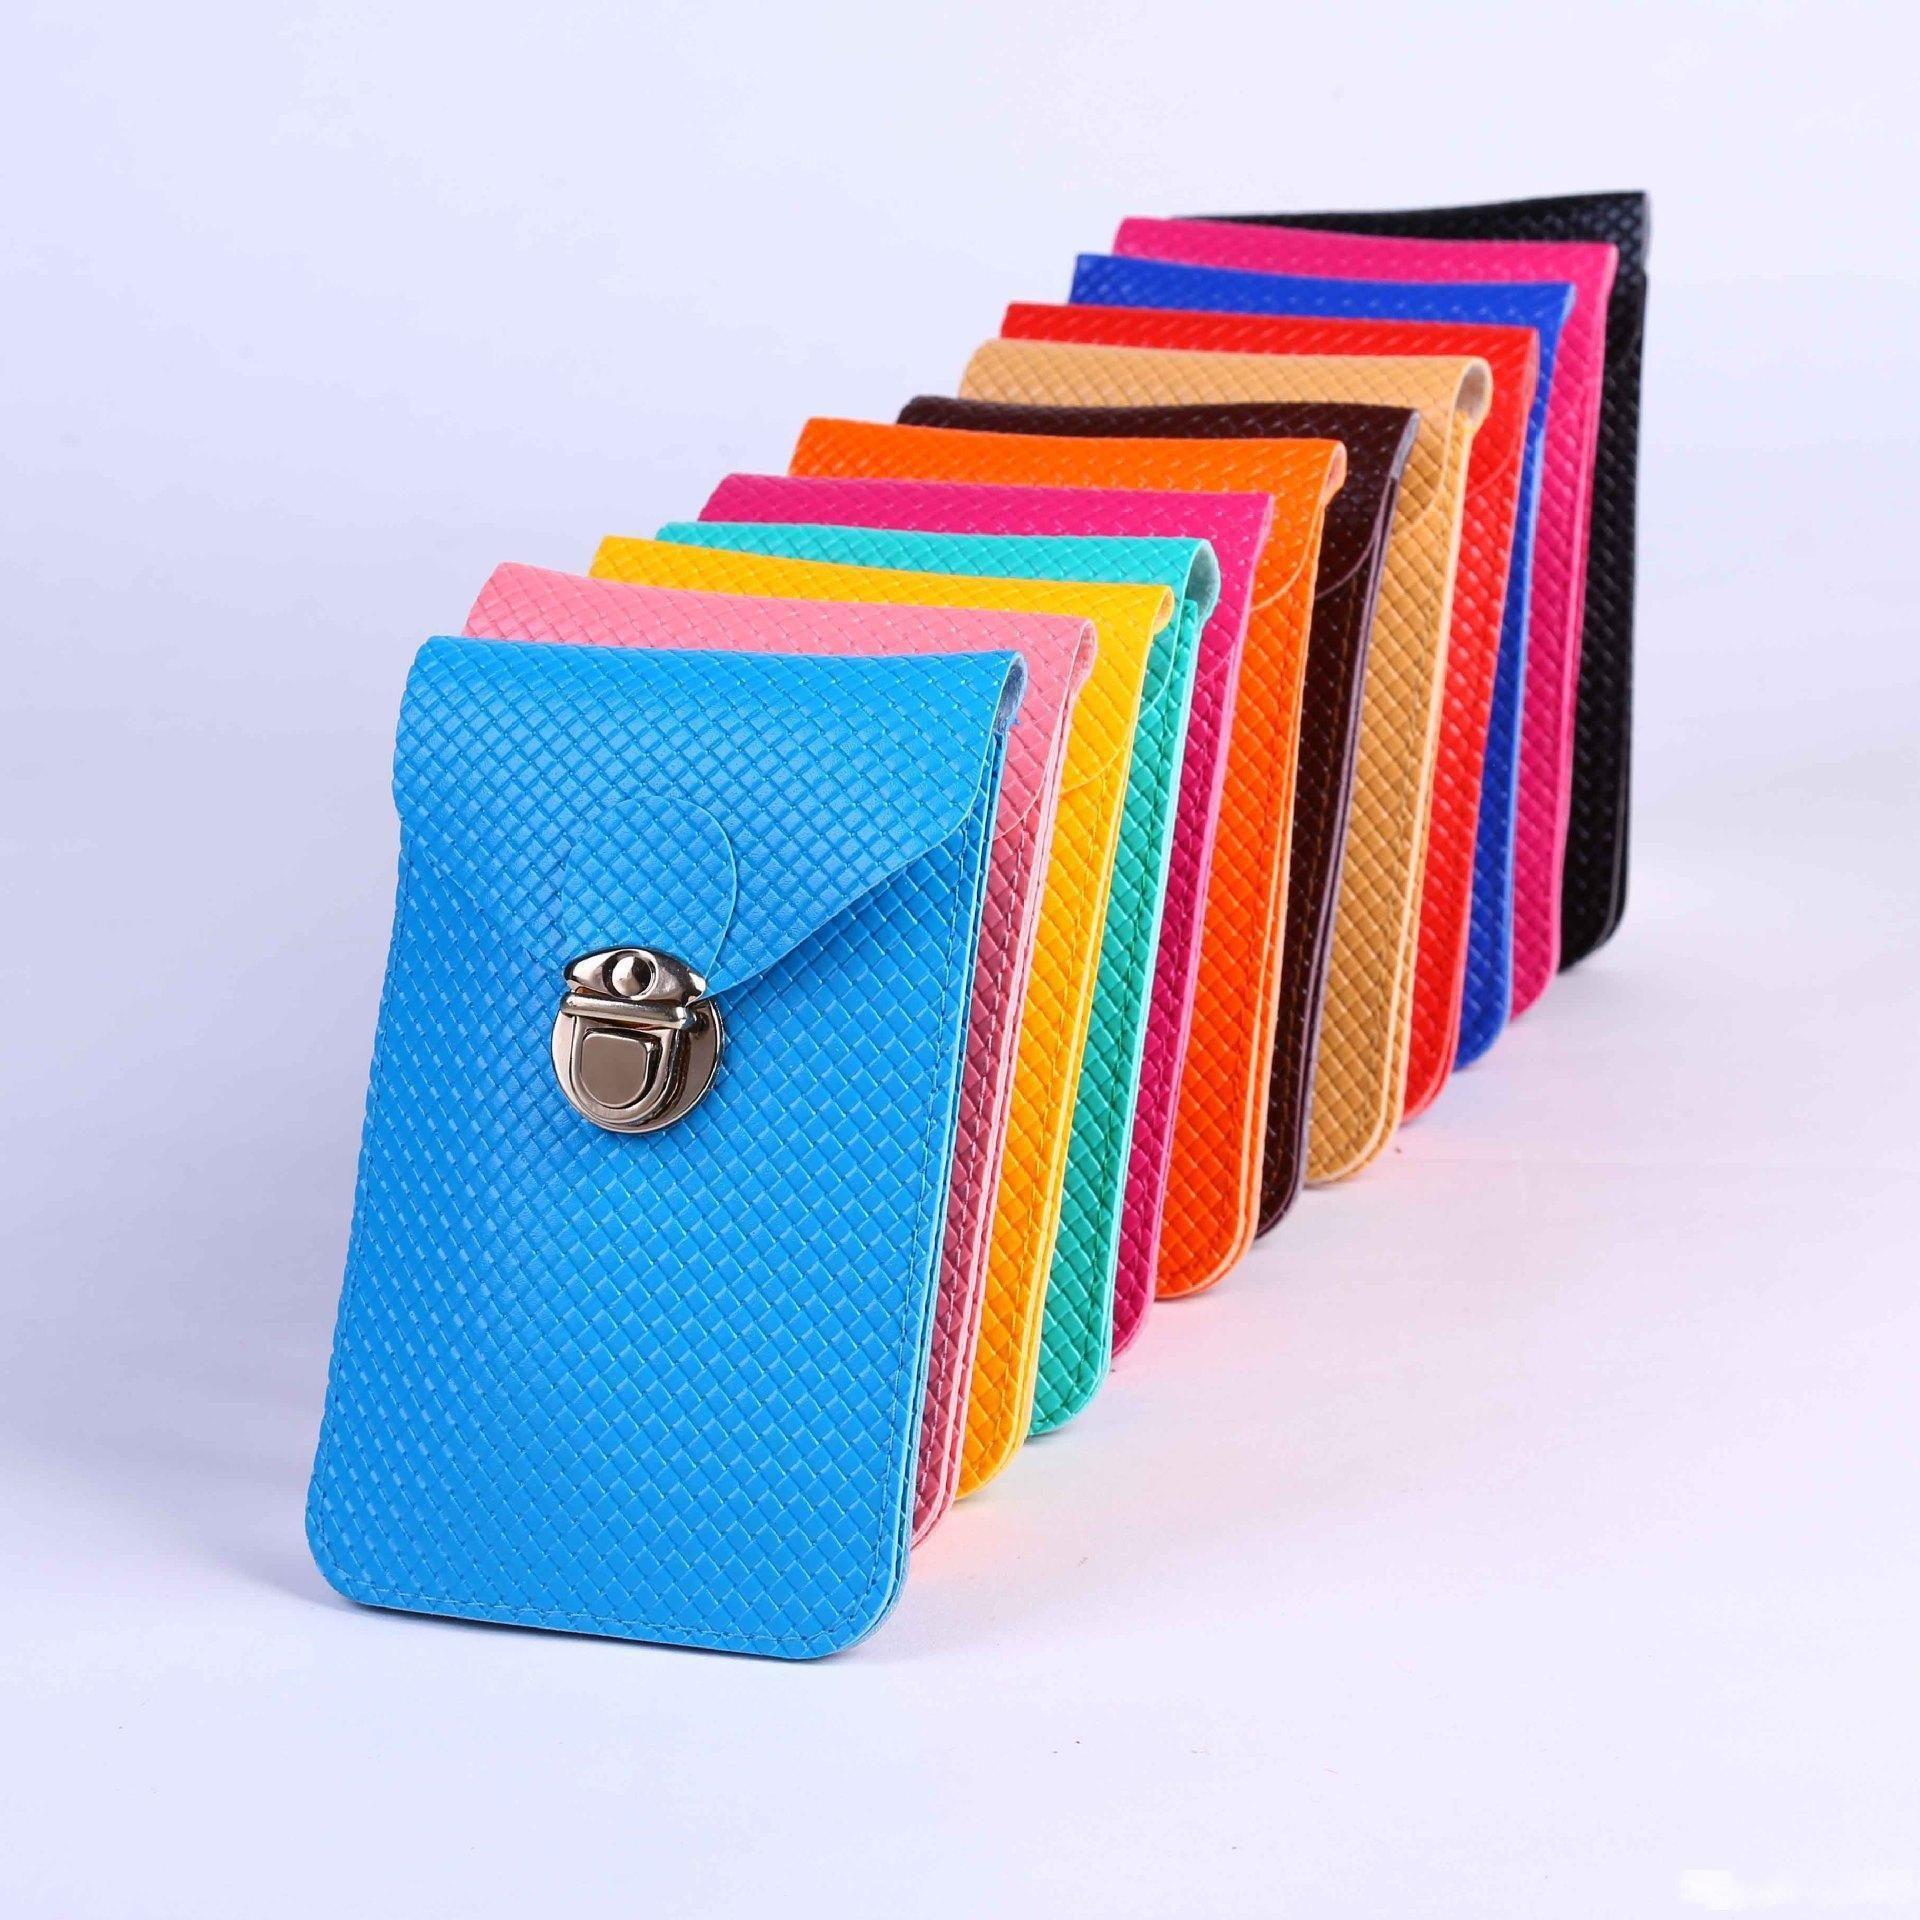 New Fashion Women Messenger Shoulder Bag Ladies Mini Bag Cell Phone PU Leather Plaid Tartan Purse Candy Colors Cross Body Bags